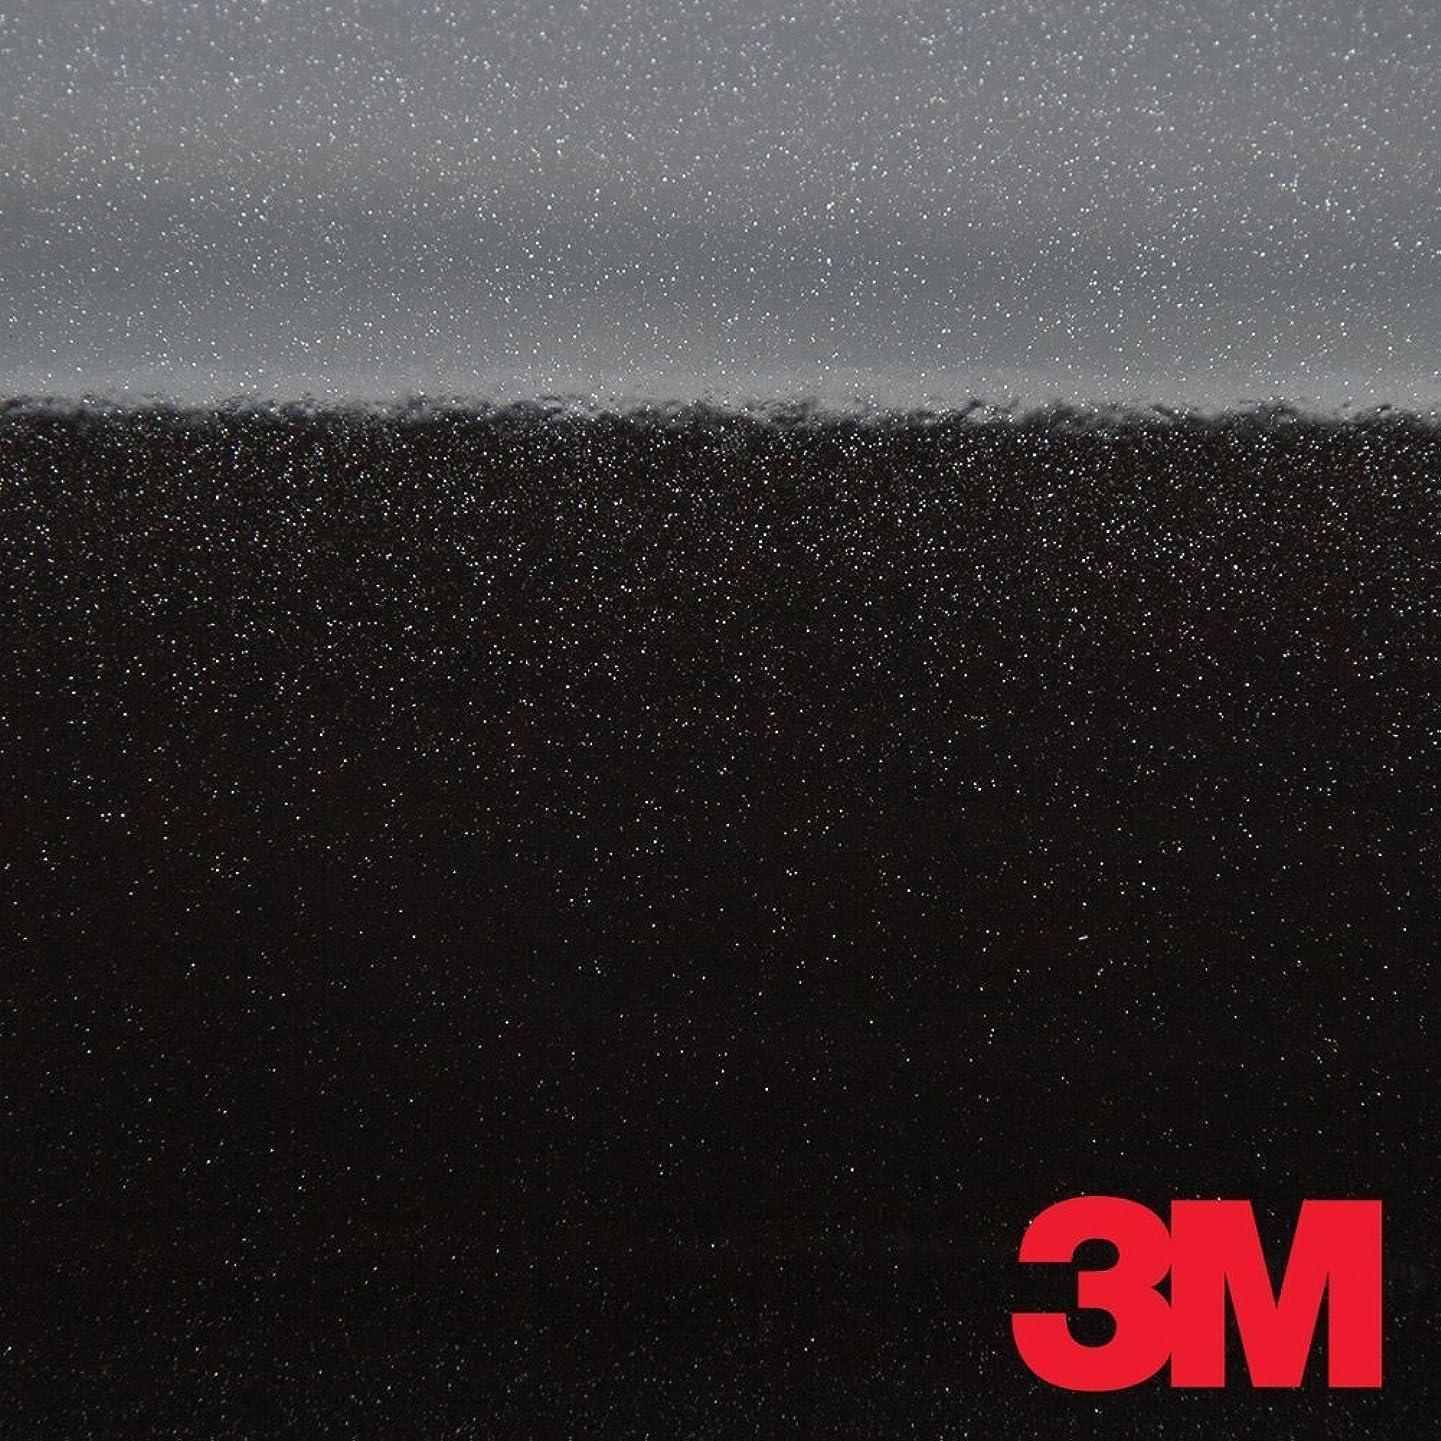 3M 1080 G212 Gloss Black Metallic 5ft x 3ft (15 Sq/ft) Car Wrap Vinyl Film g559039488583643